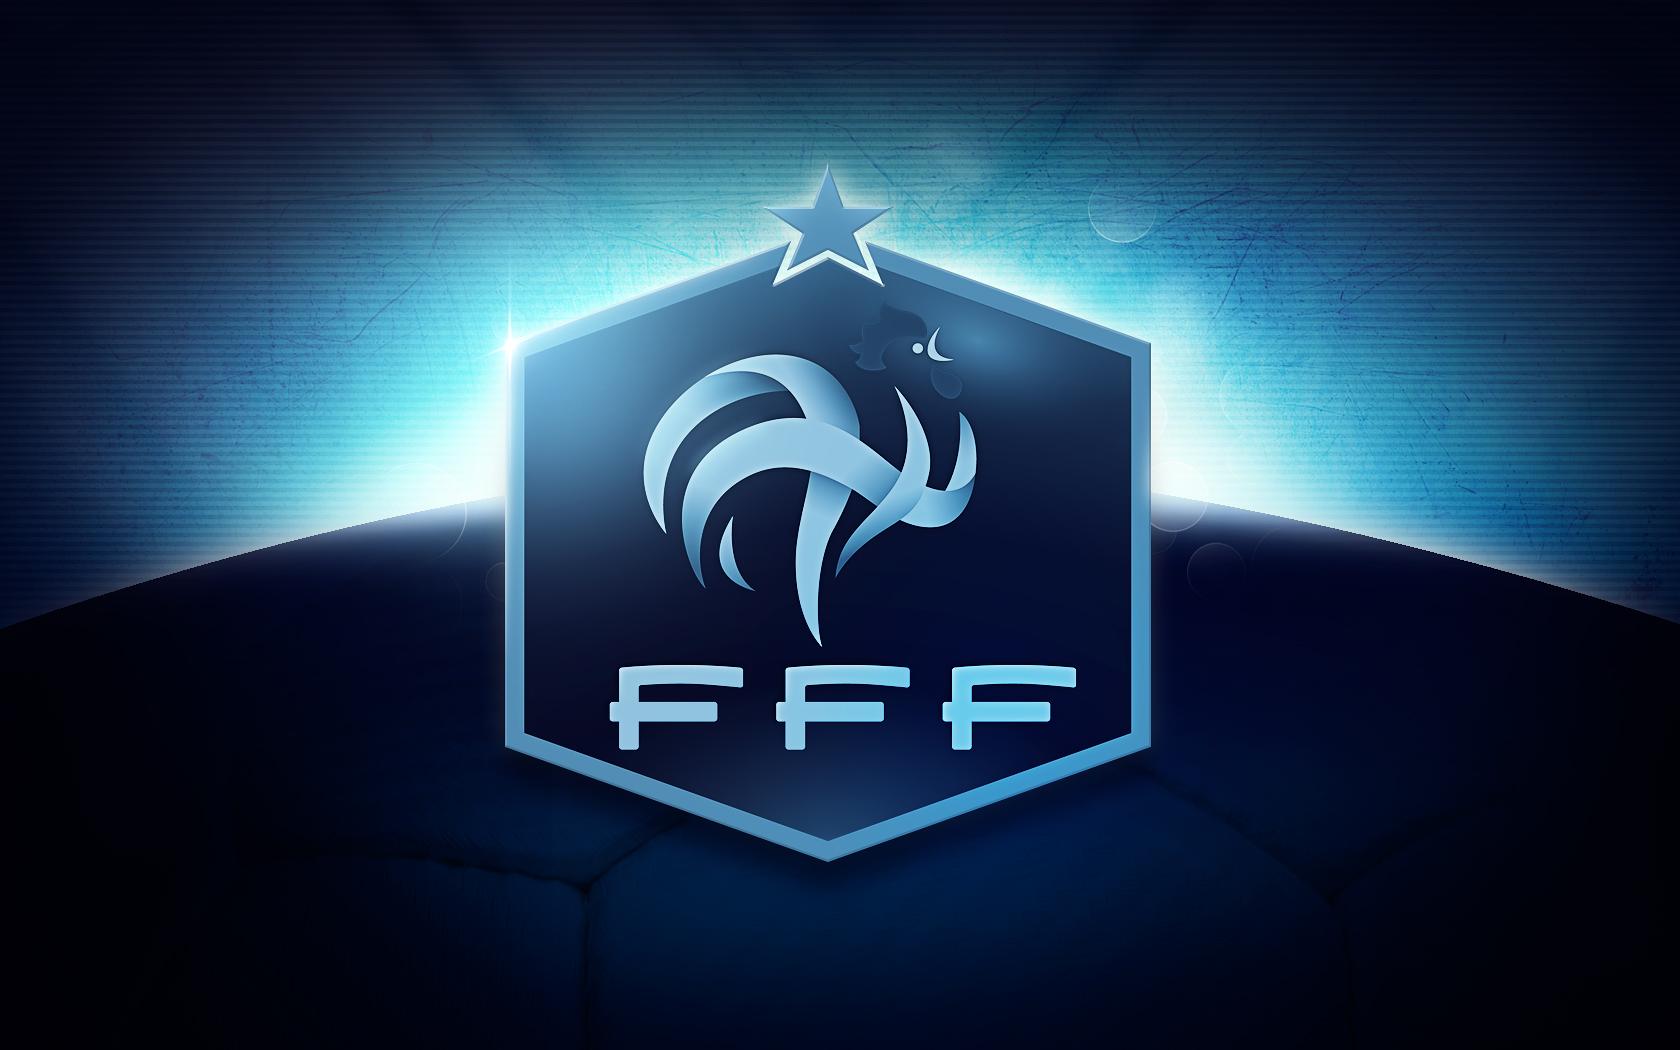 FFF wallpaper